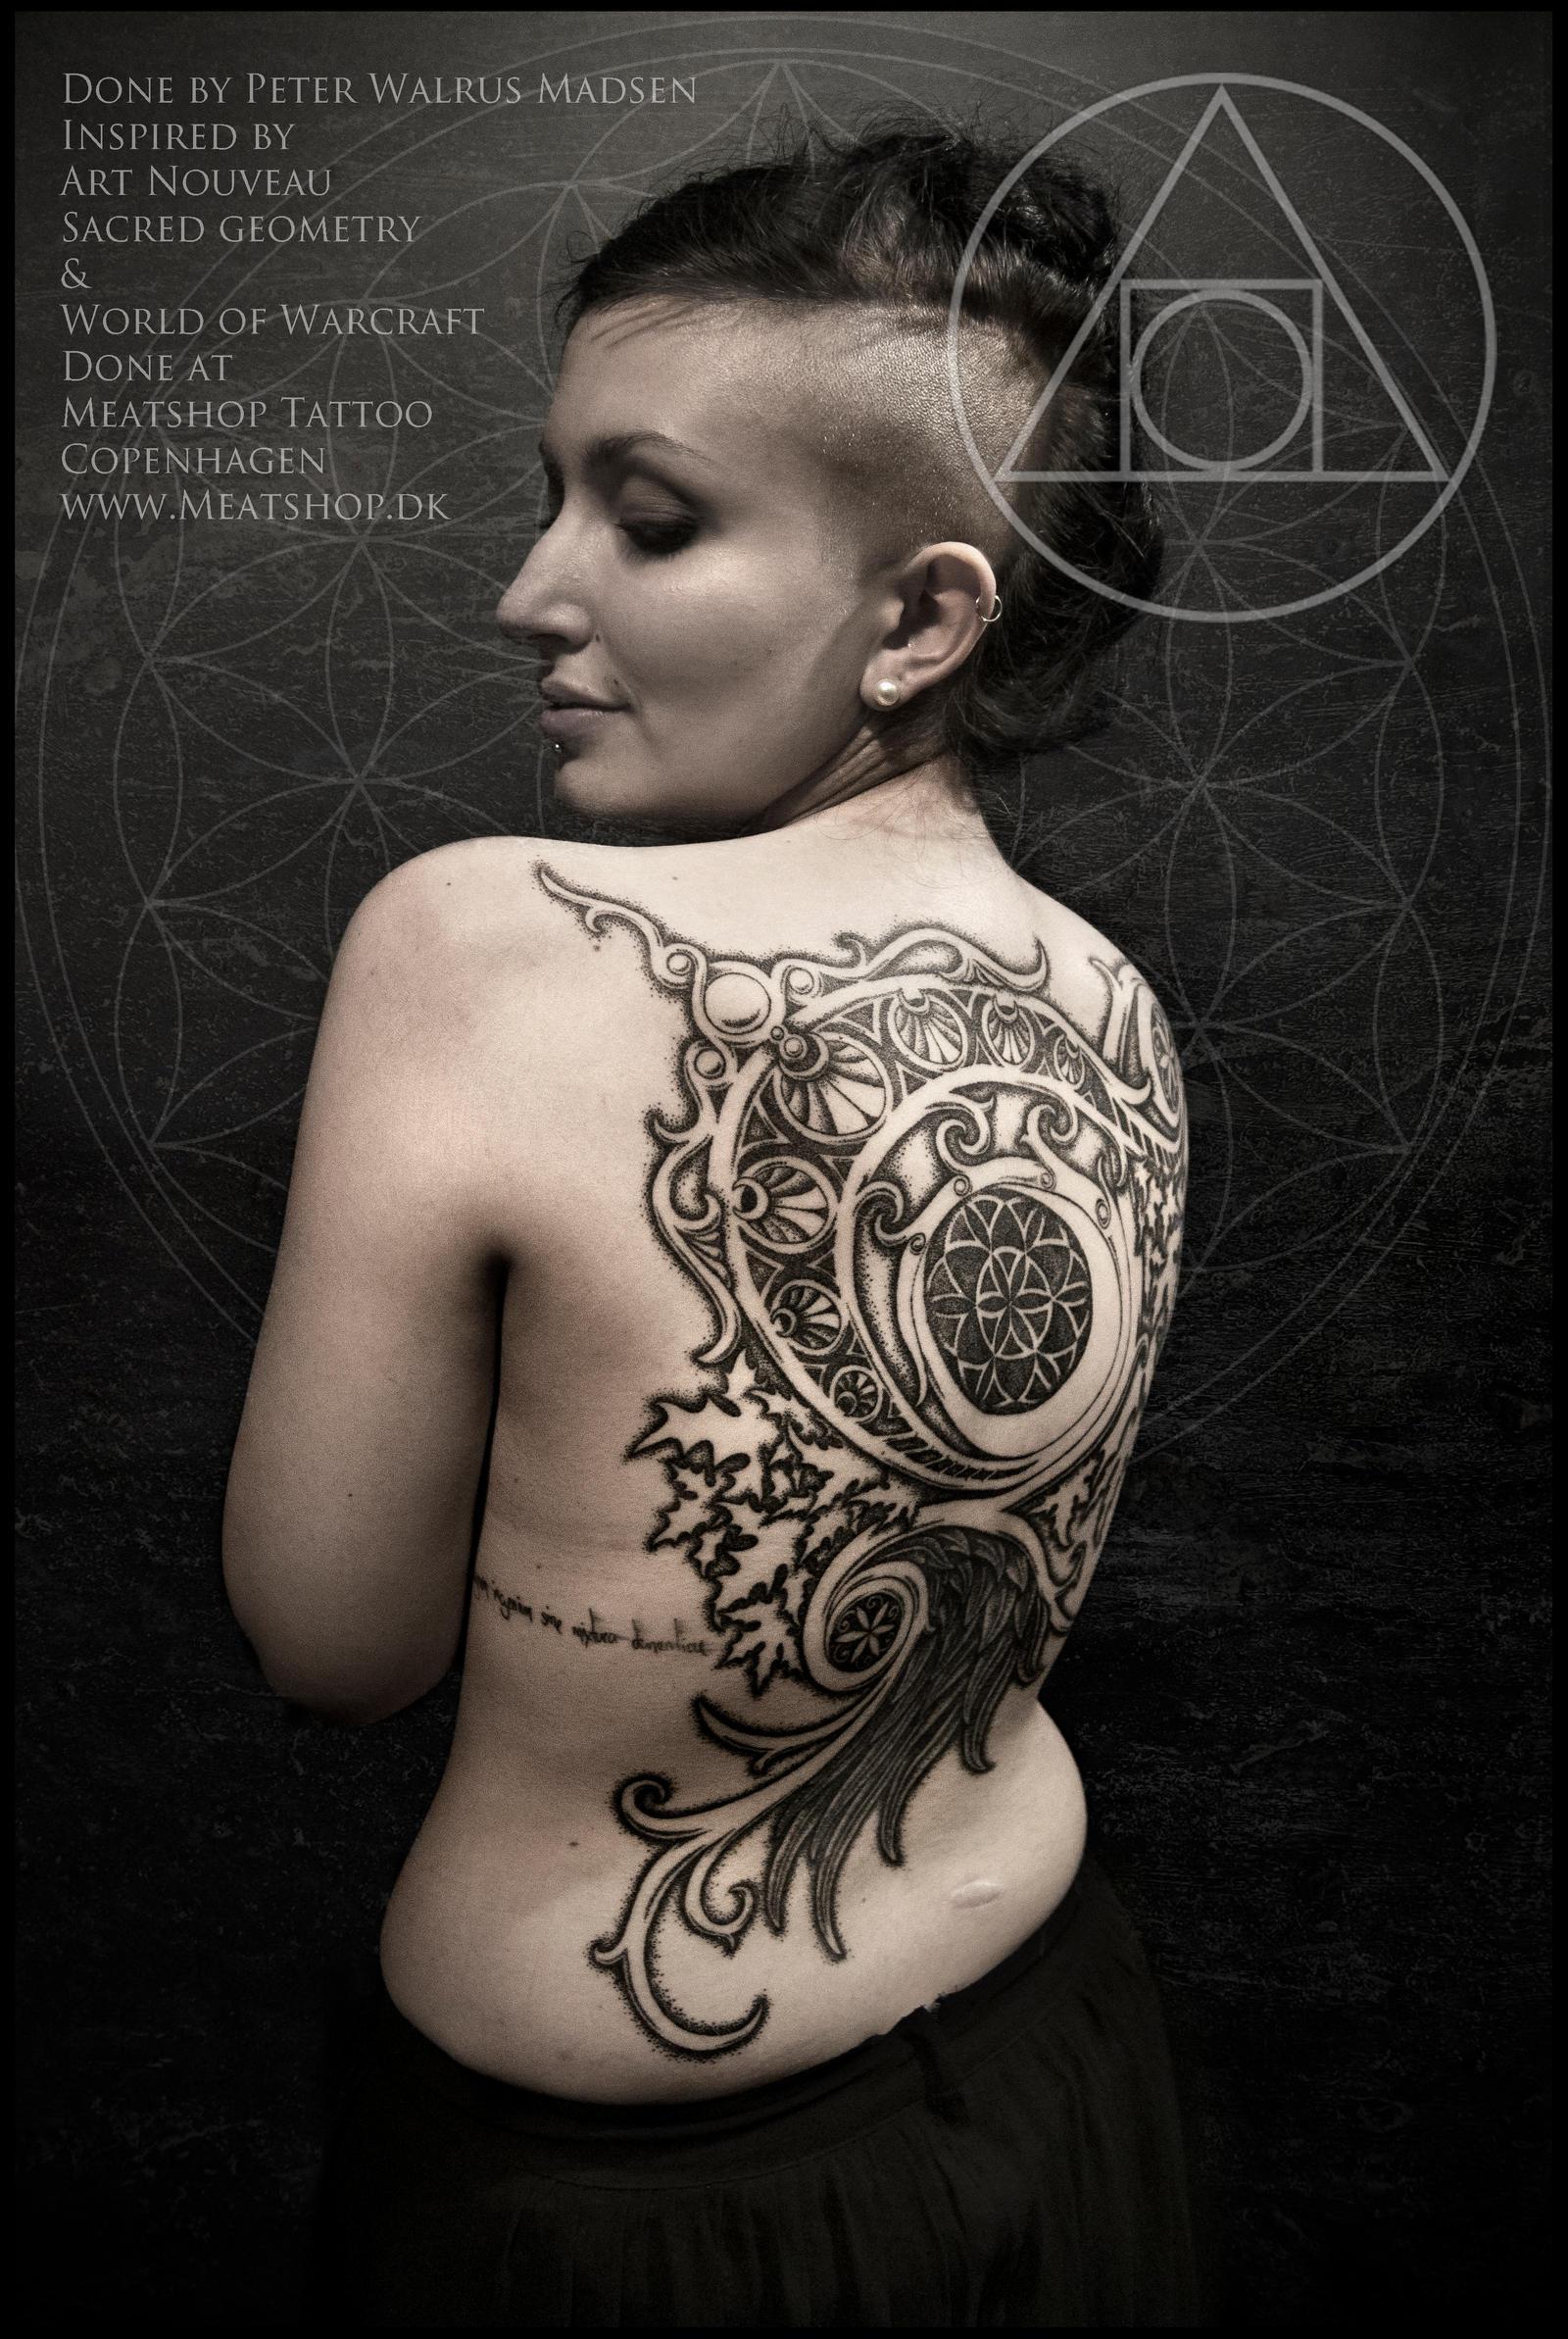 World of Warcraft Moongoddess tattoo pro-shot by Meatshop-Tattoo